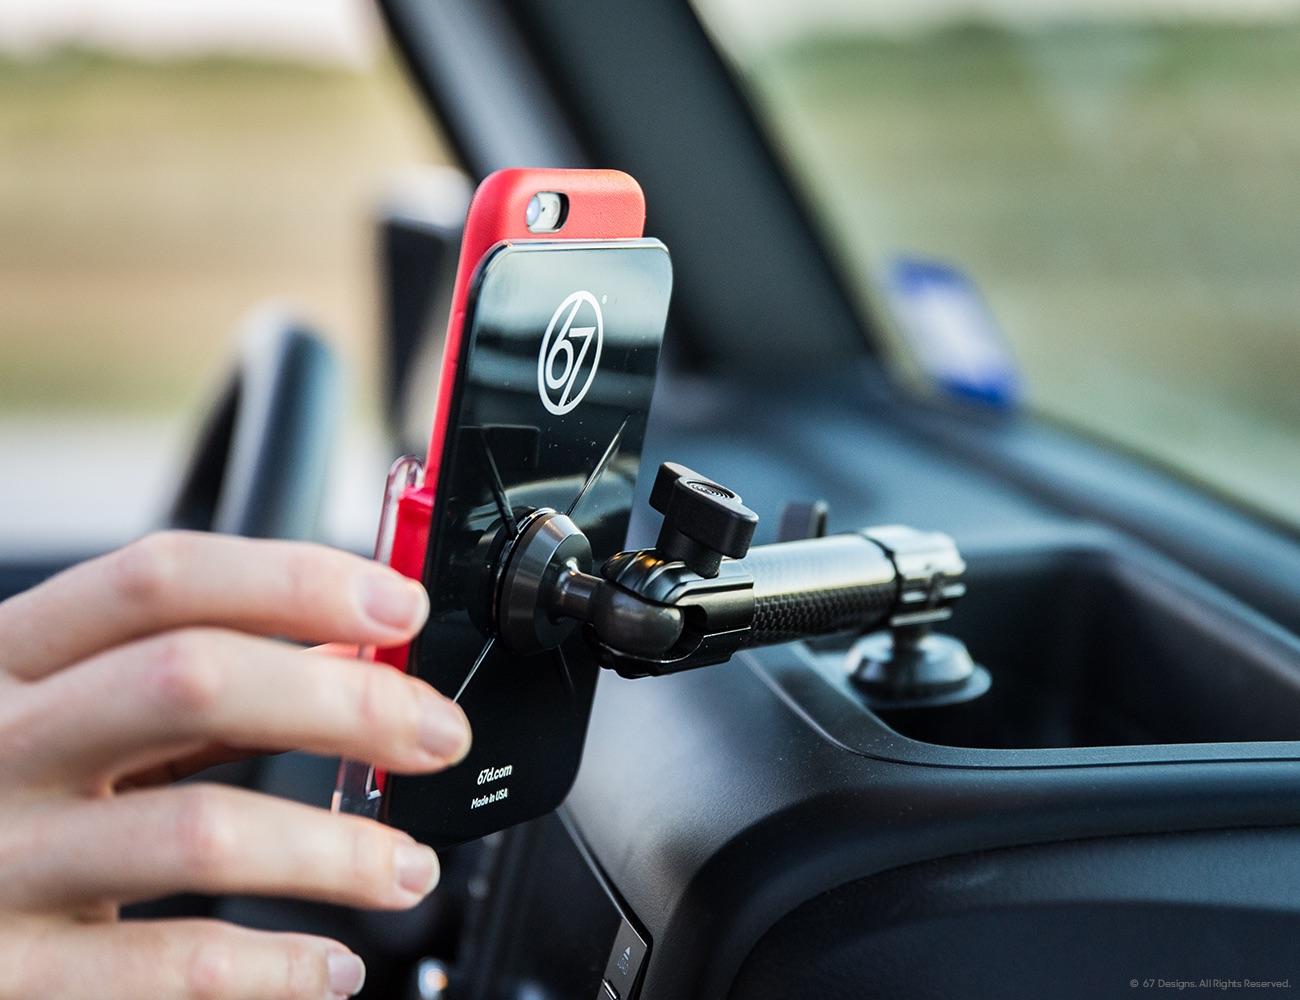 Cf Carbon Fiber Series Jeep Jk Mount For Iphone 6 6s